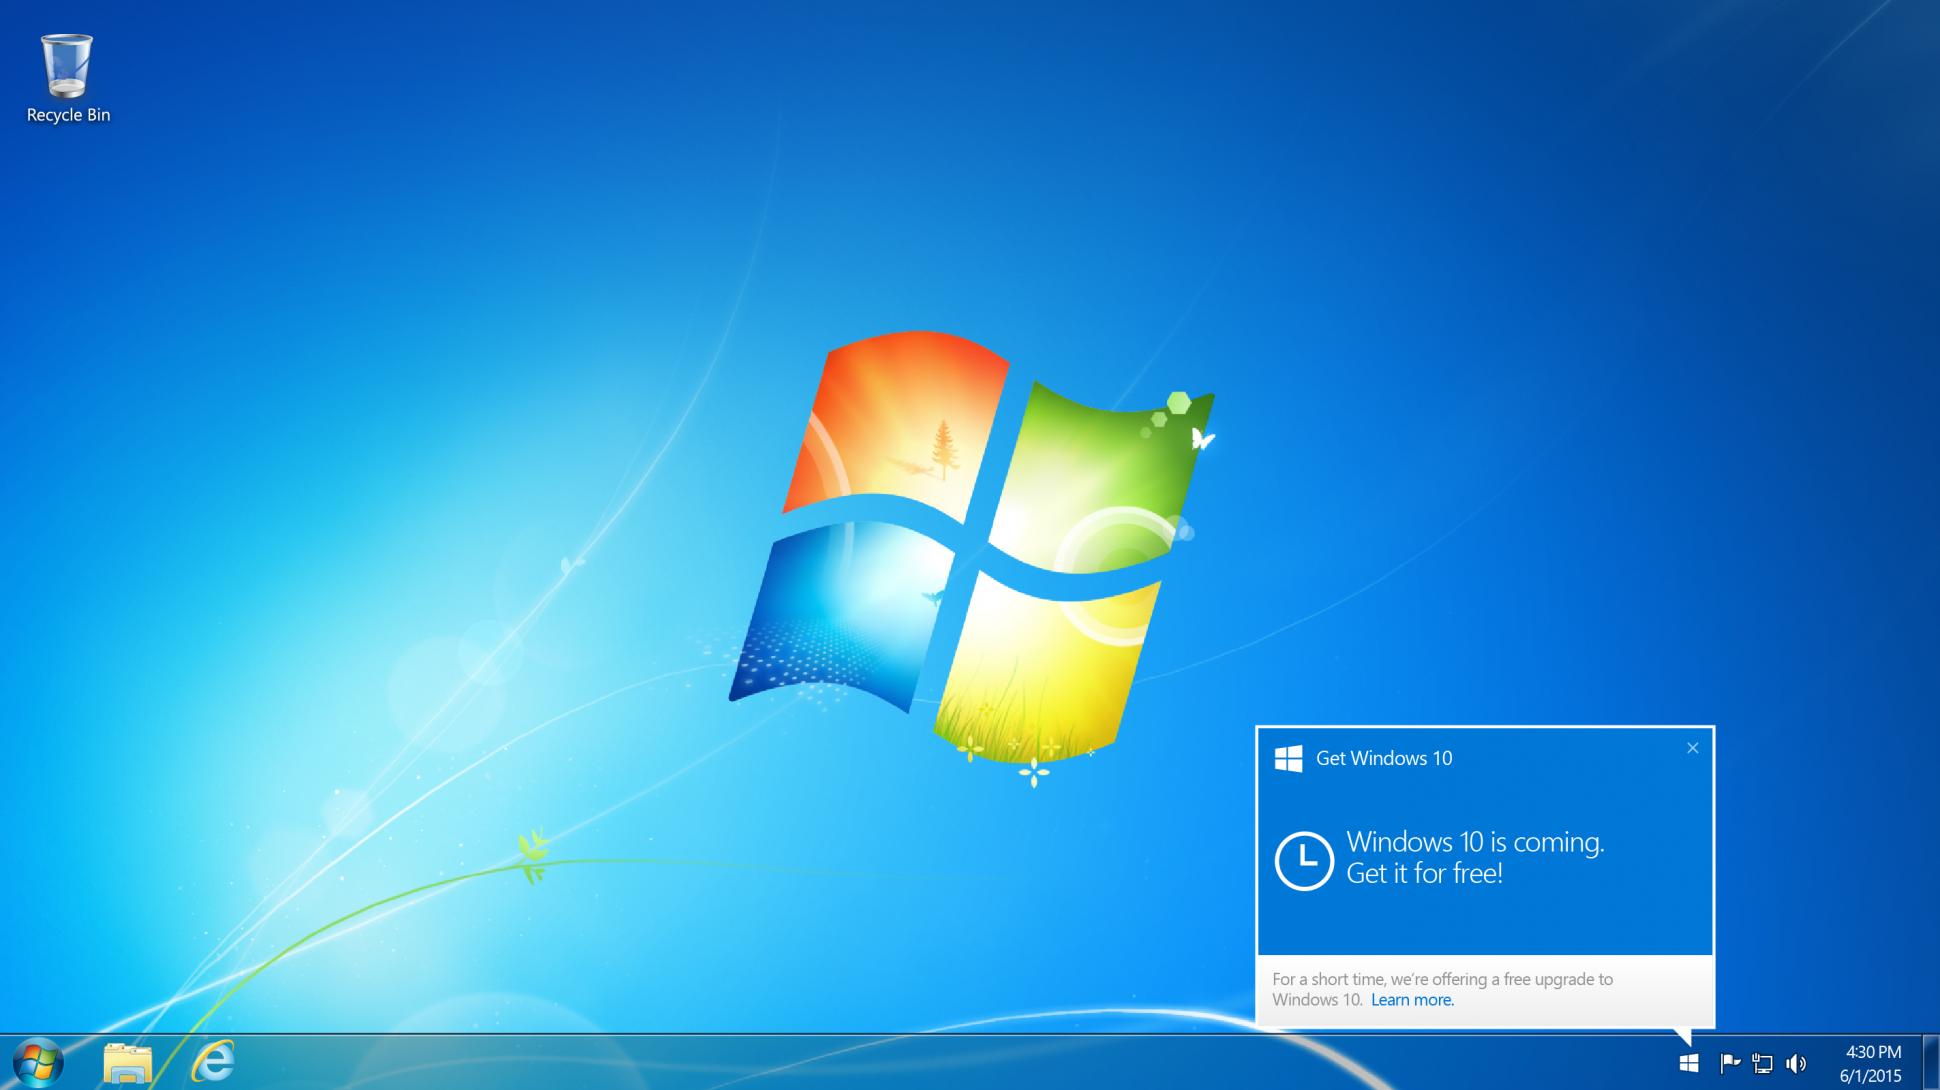 Windows-10-free-1940x1090